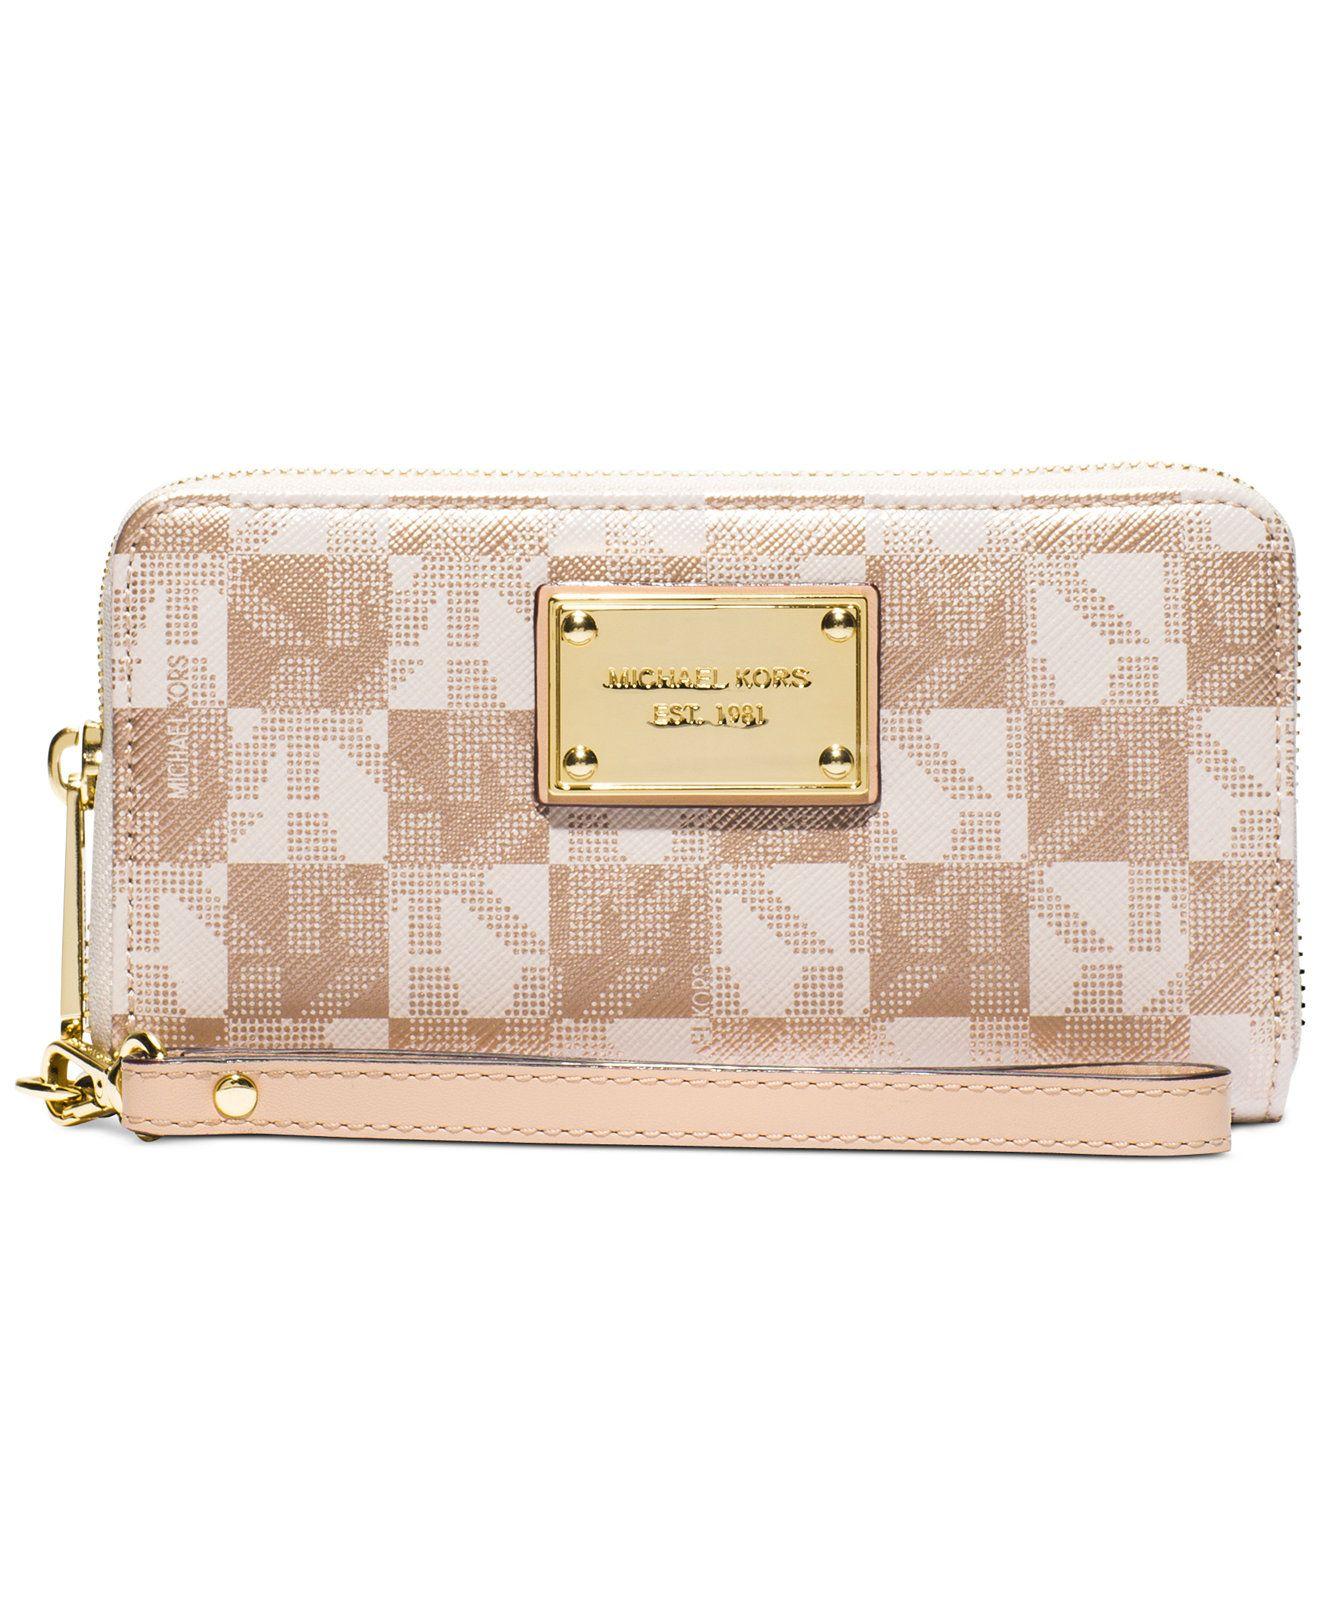 1298f5876099 MICHAEL Michael Kors Jet Set Item Large Coin Multifunction Wallet - Handbags    Accessories - Macy s